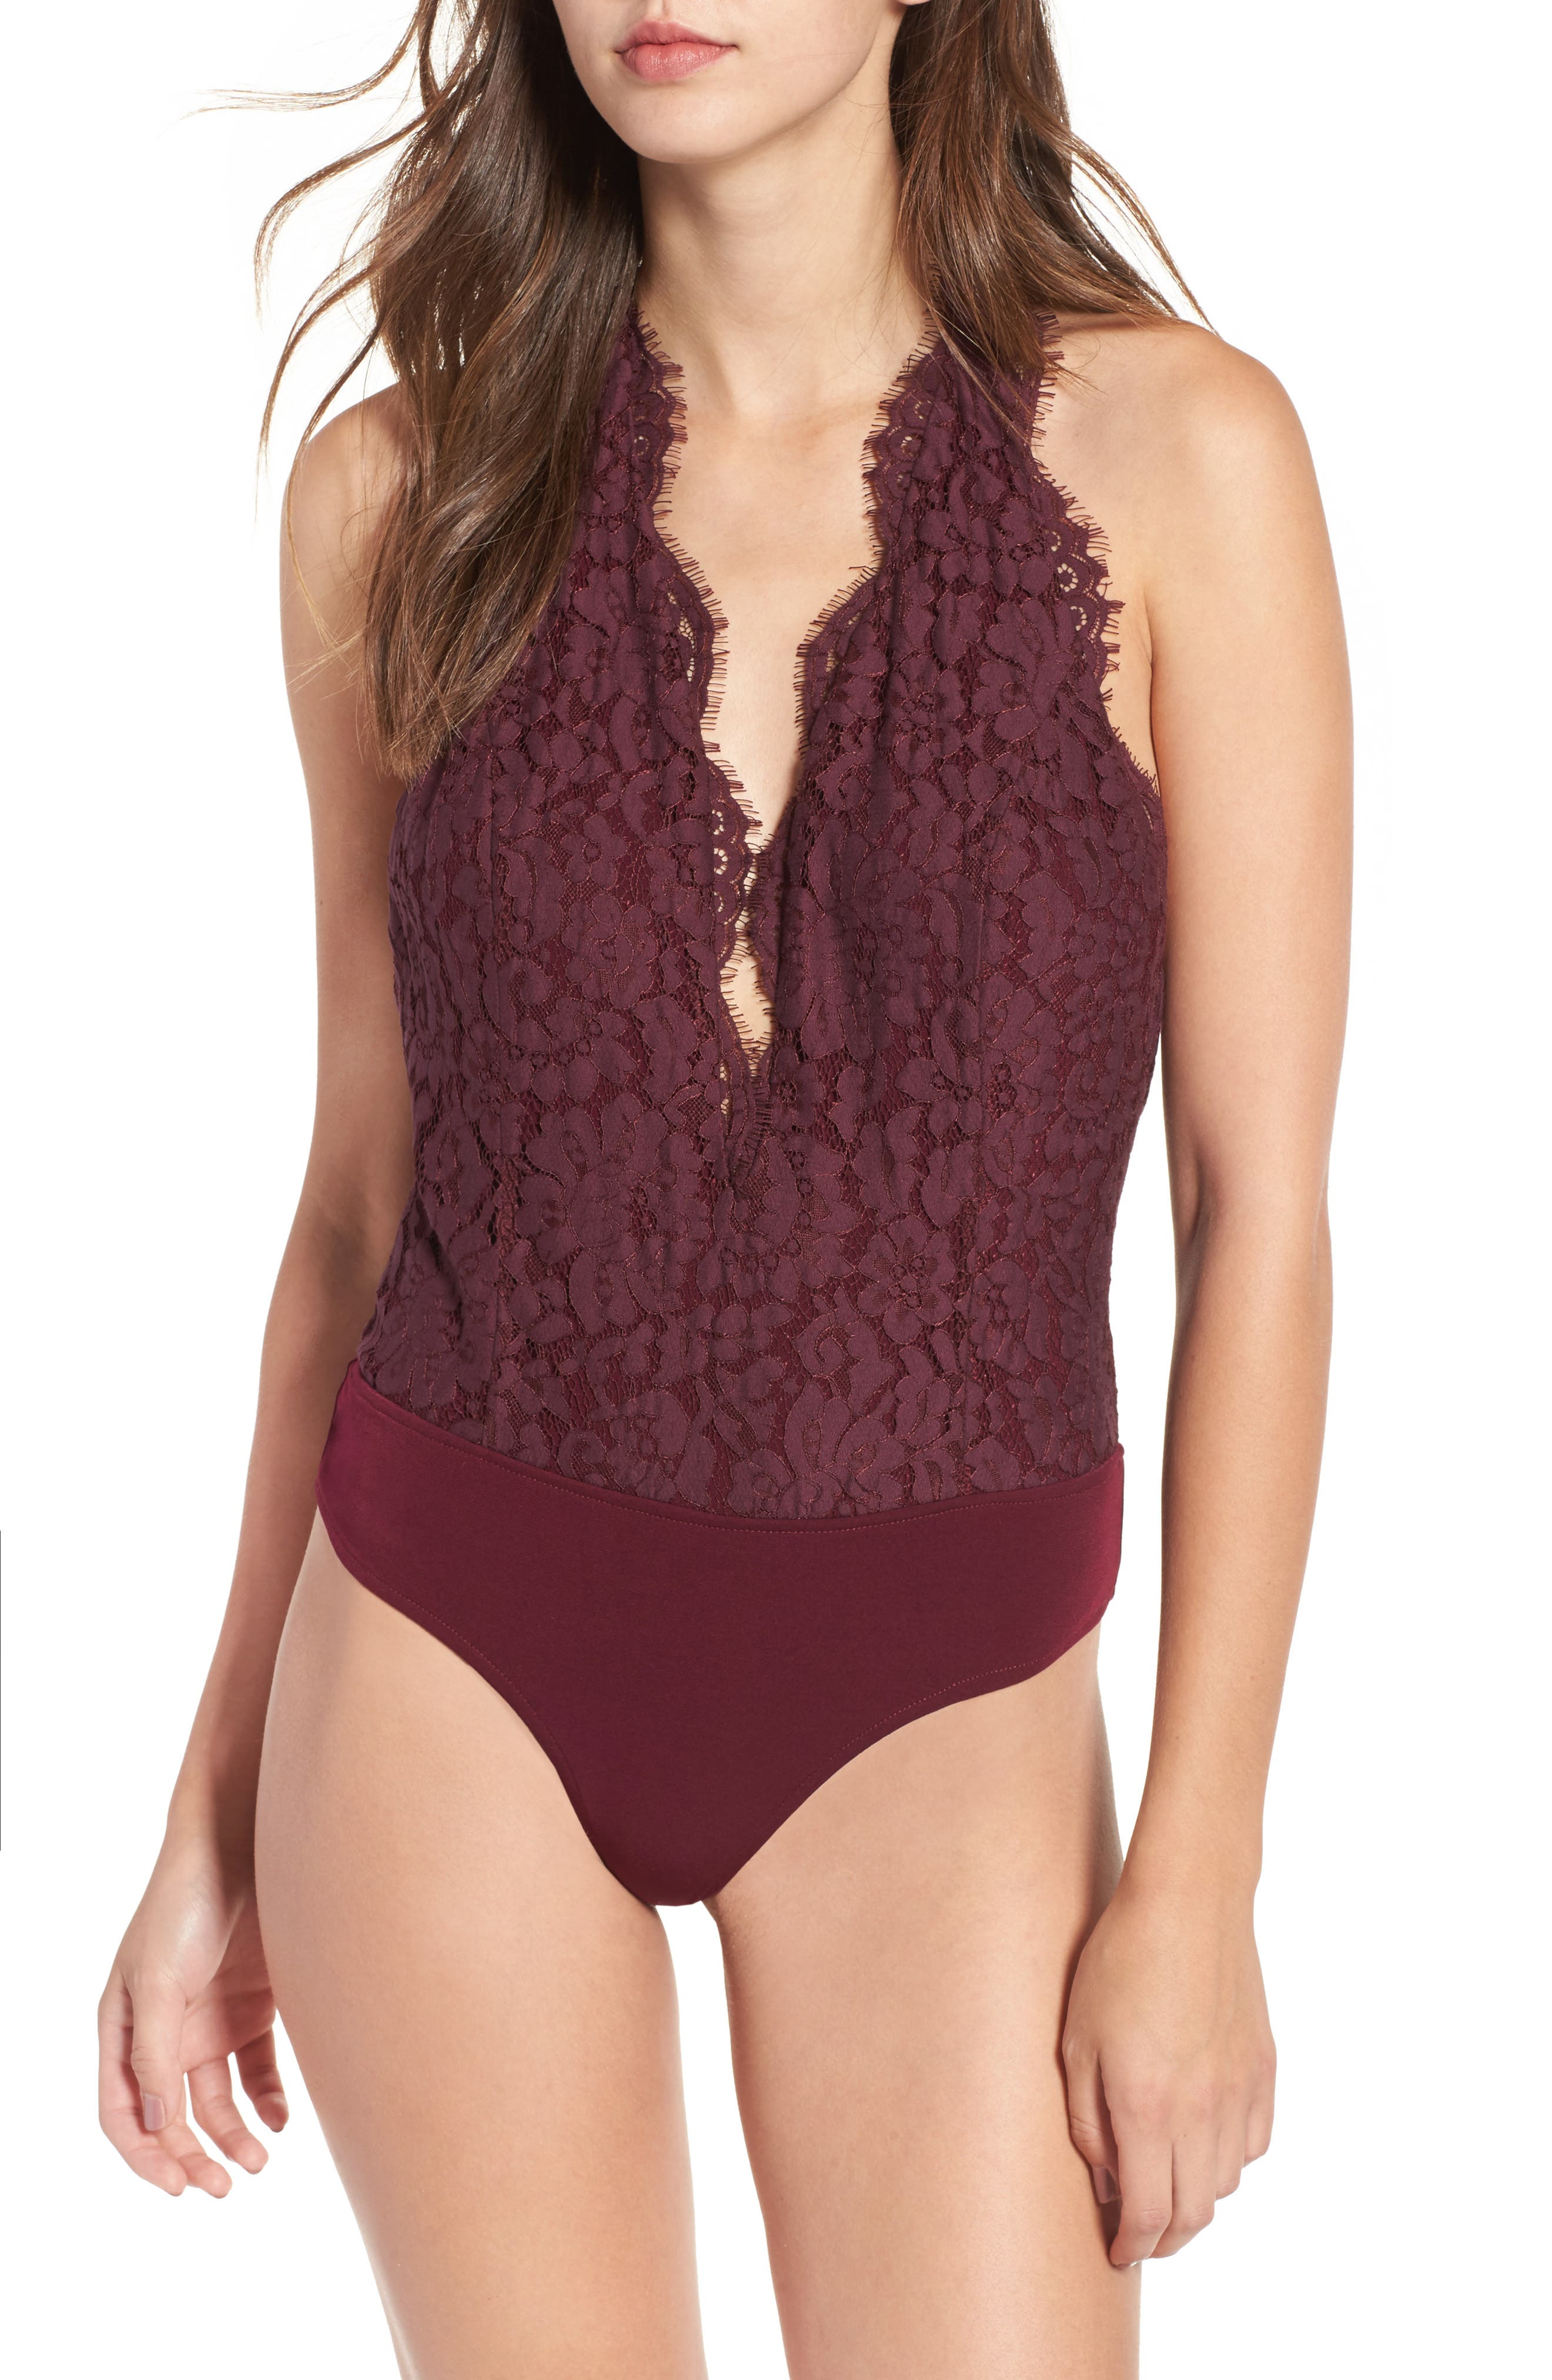 Rosalyn Lace Thong Bodysuit,                             Alternate thumbnail 2, color,                             938